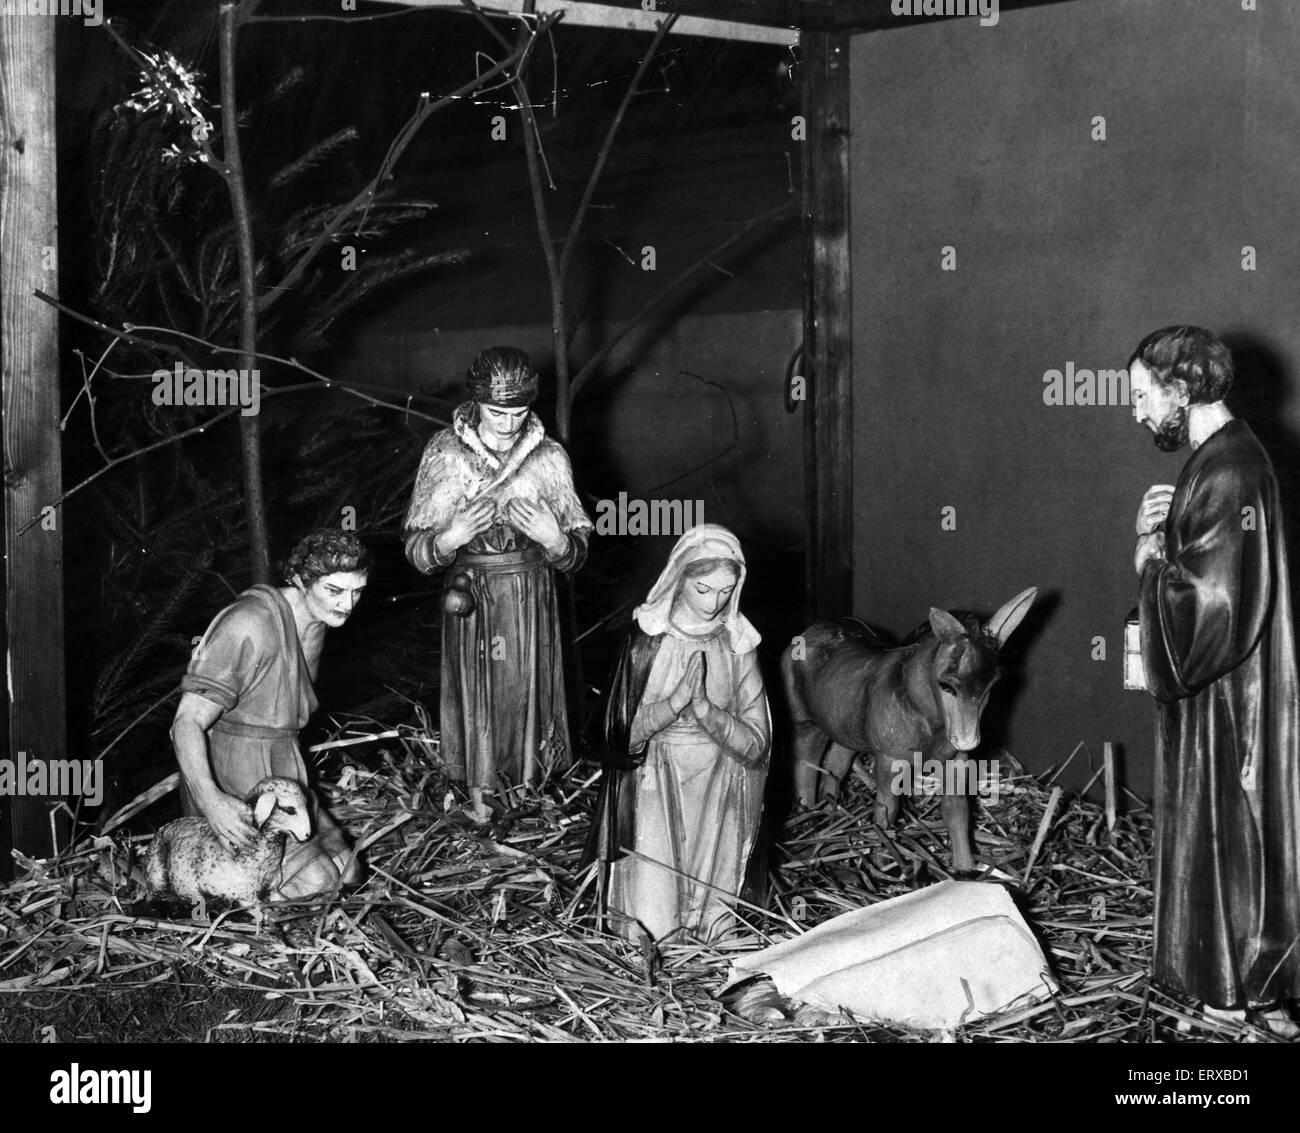 Nativity Scene, Published Cardiff Echo, 24th December 1959. - Stock Image